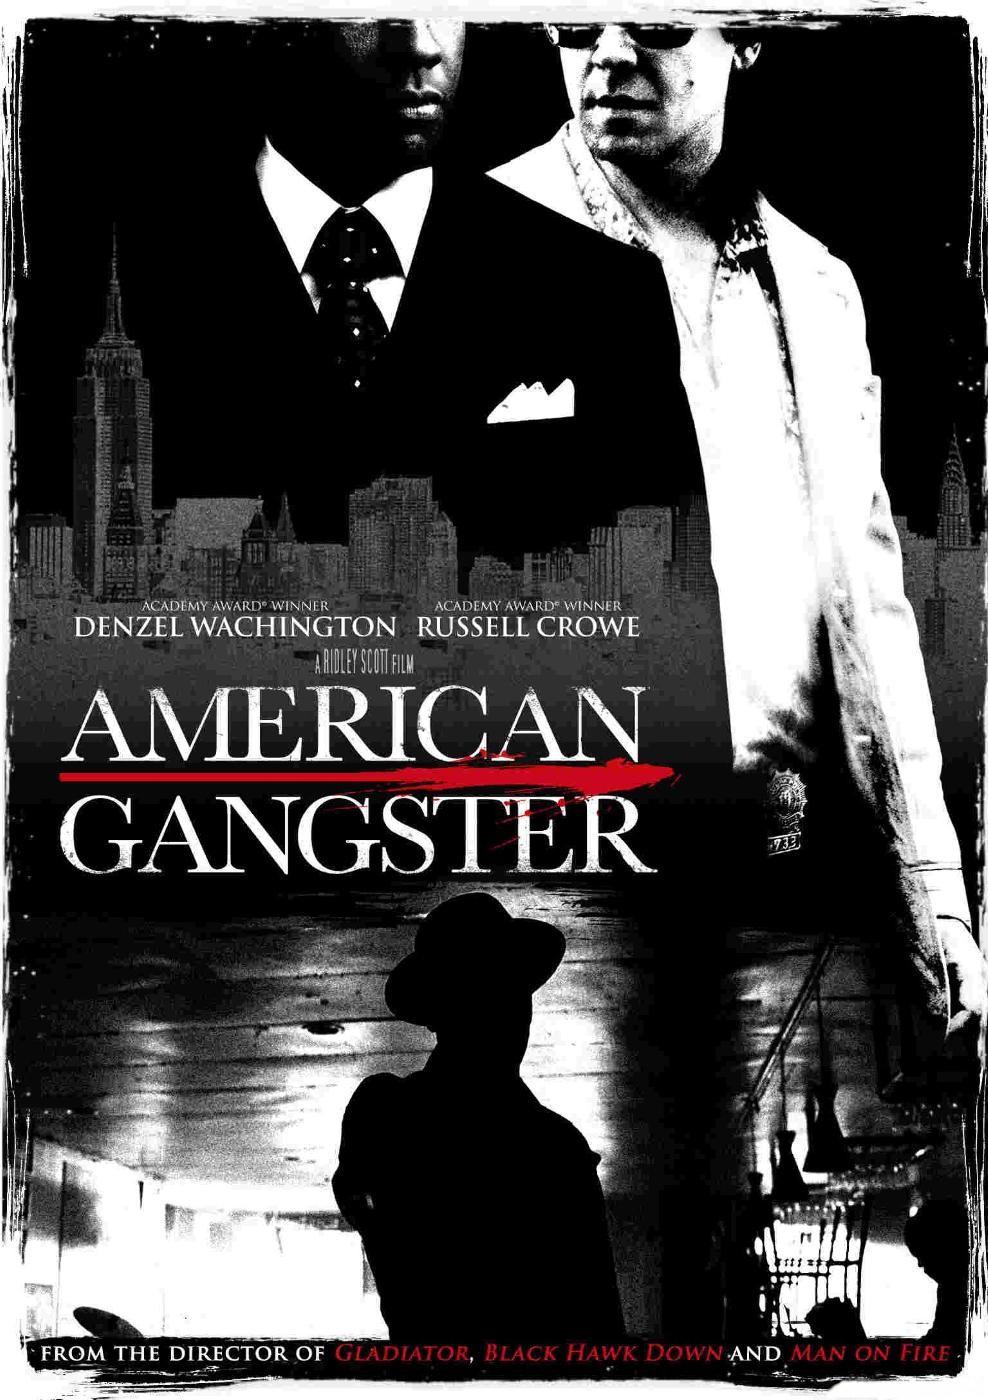 Amaerican Gangster